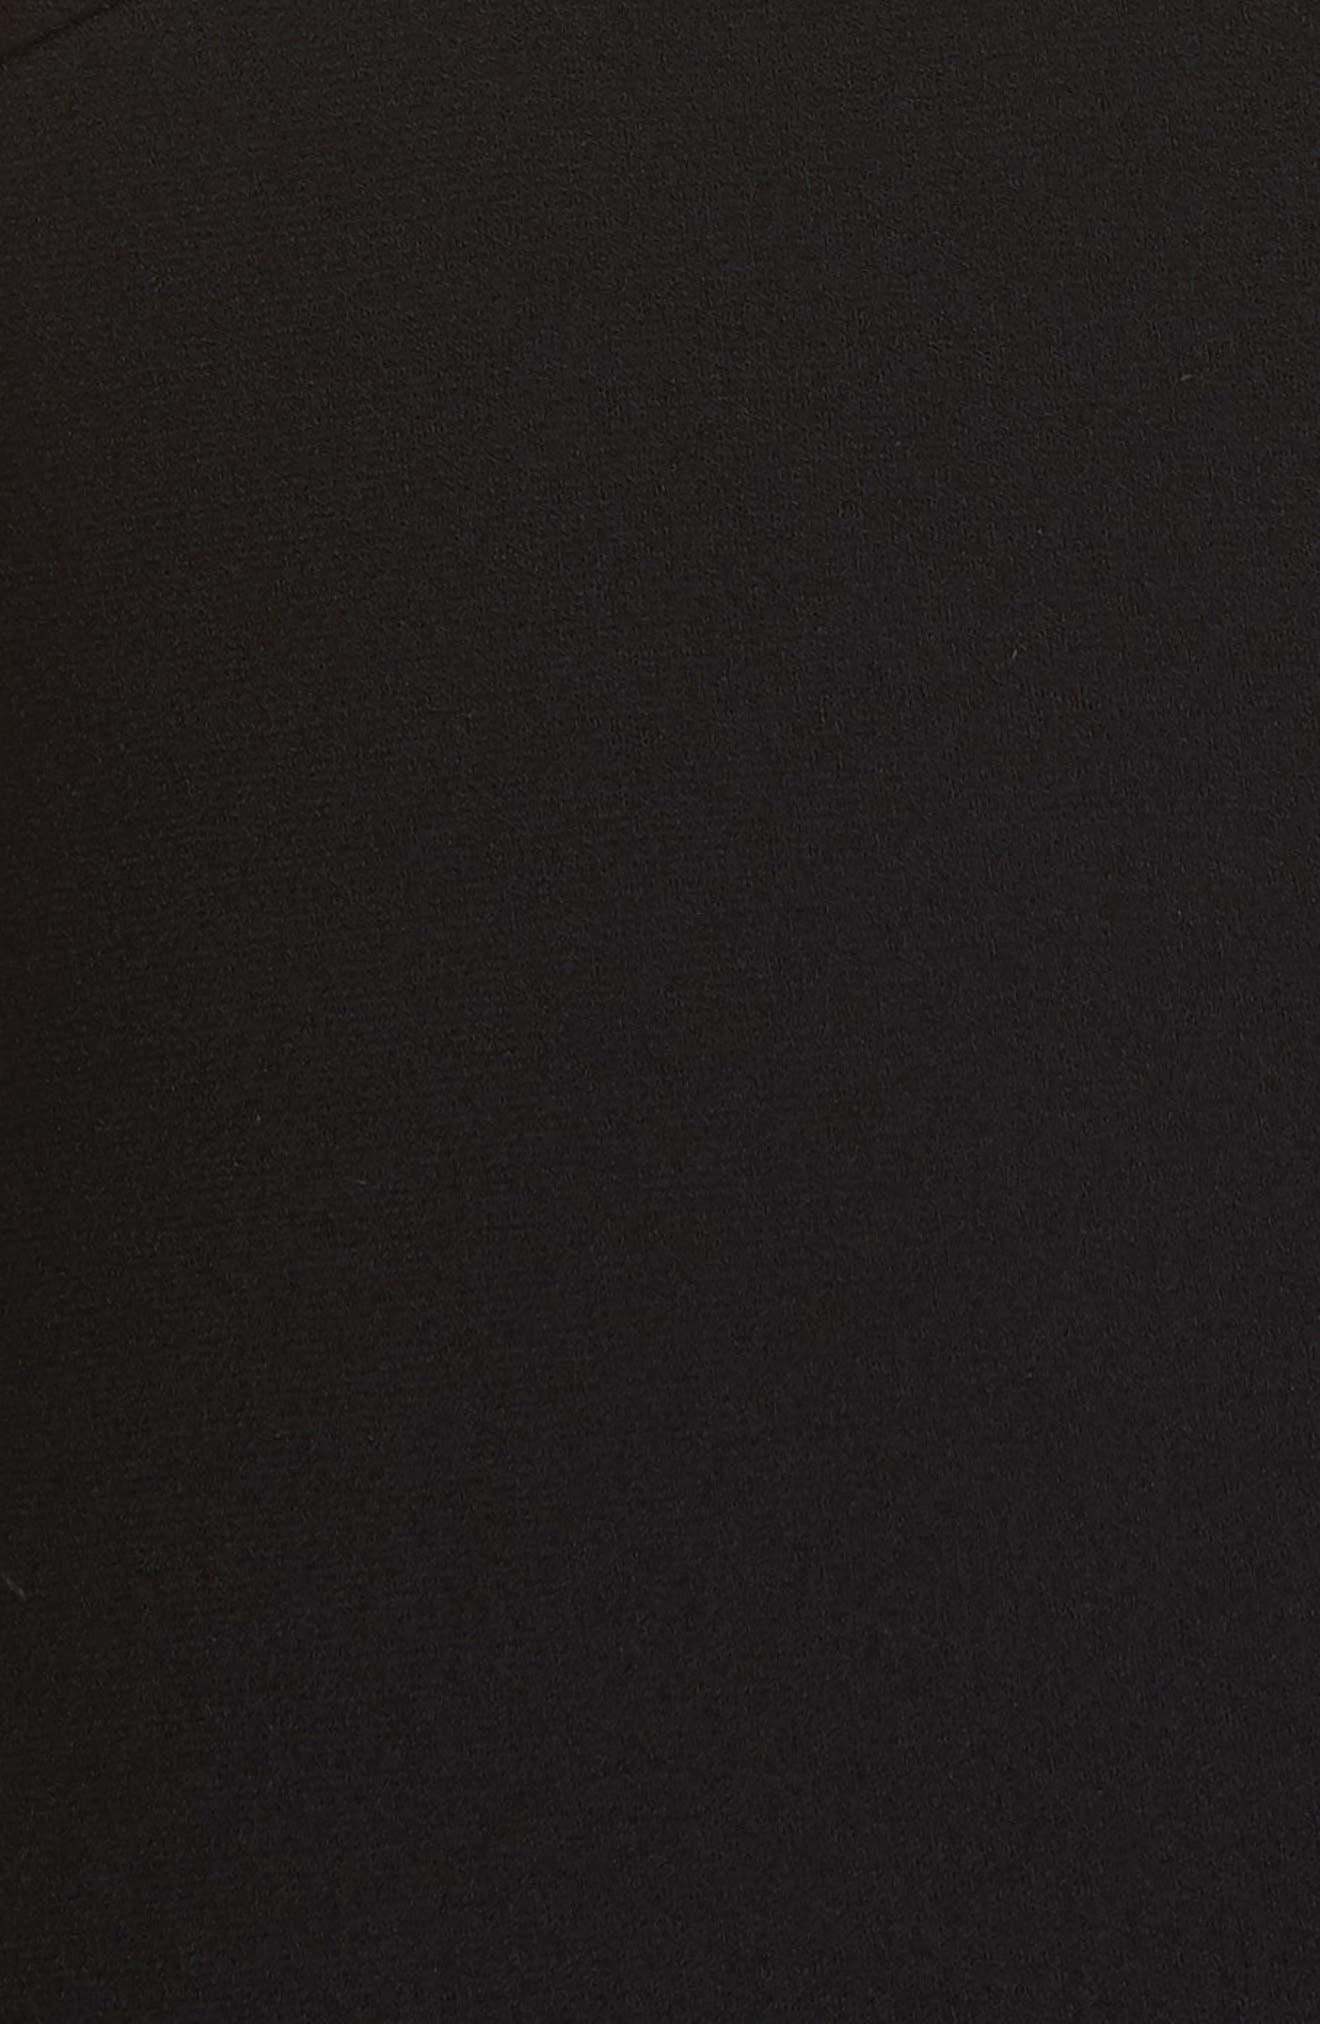 VICTORIA BECKHAM, Back Zip Body-Con Dress, Alternate thumbnail 6, color, BLACK